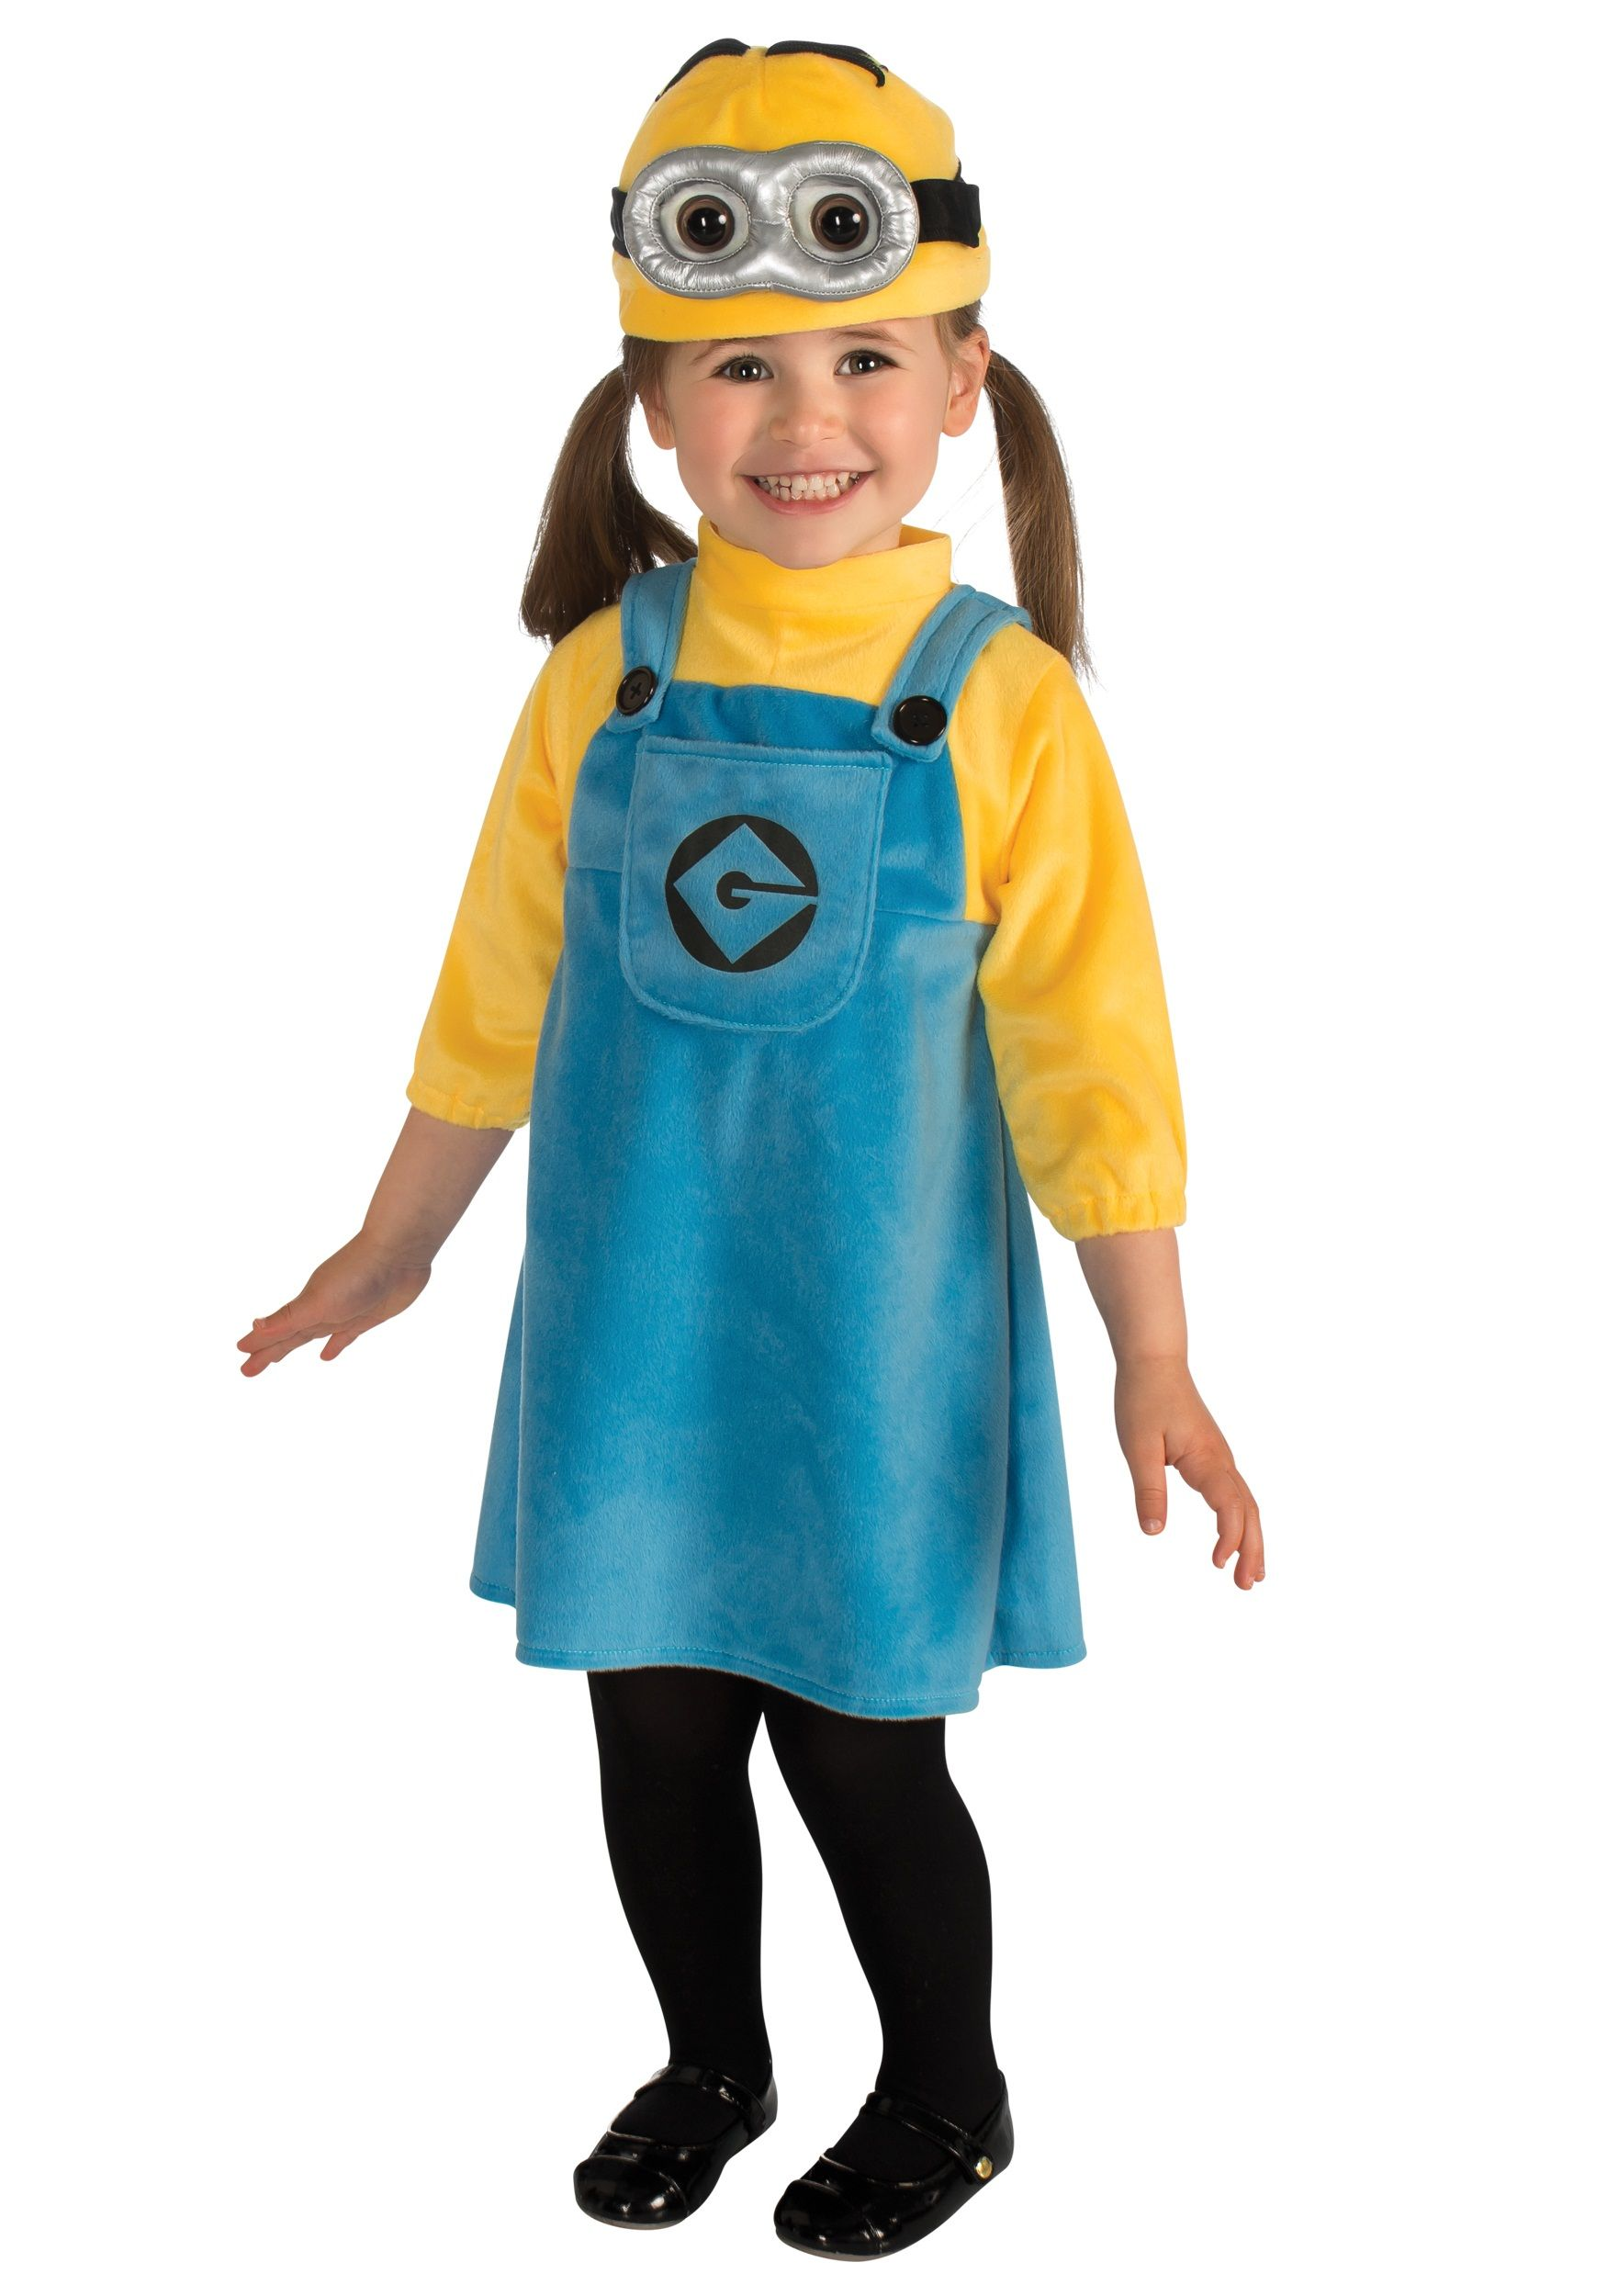 Toddler Girls Minion Costume | Girl minion costume, Girl minion ...